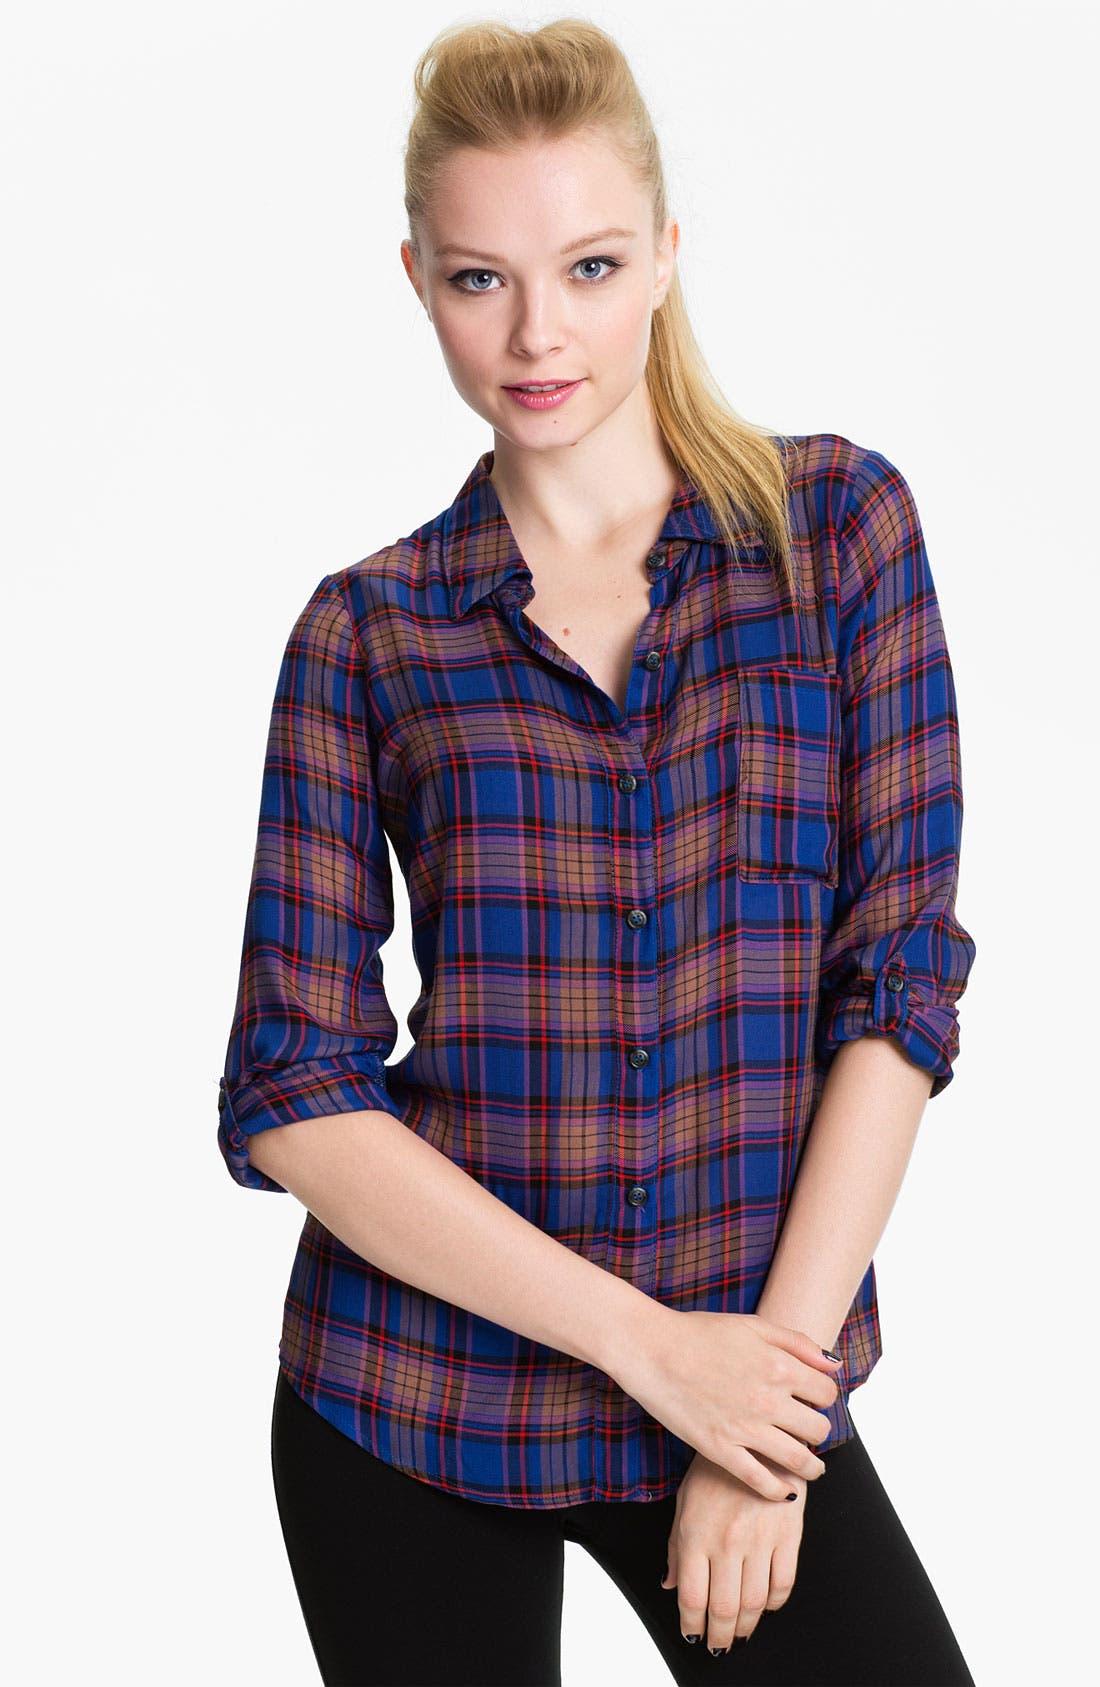 Alternate Image 1 Selected - Splendid 'Charlee' Plaid Shirt